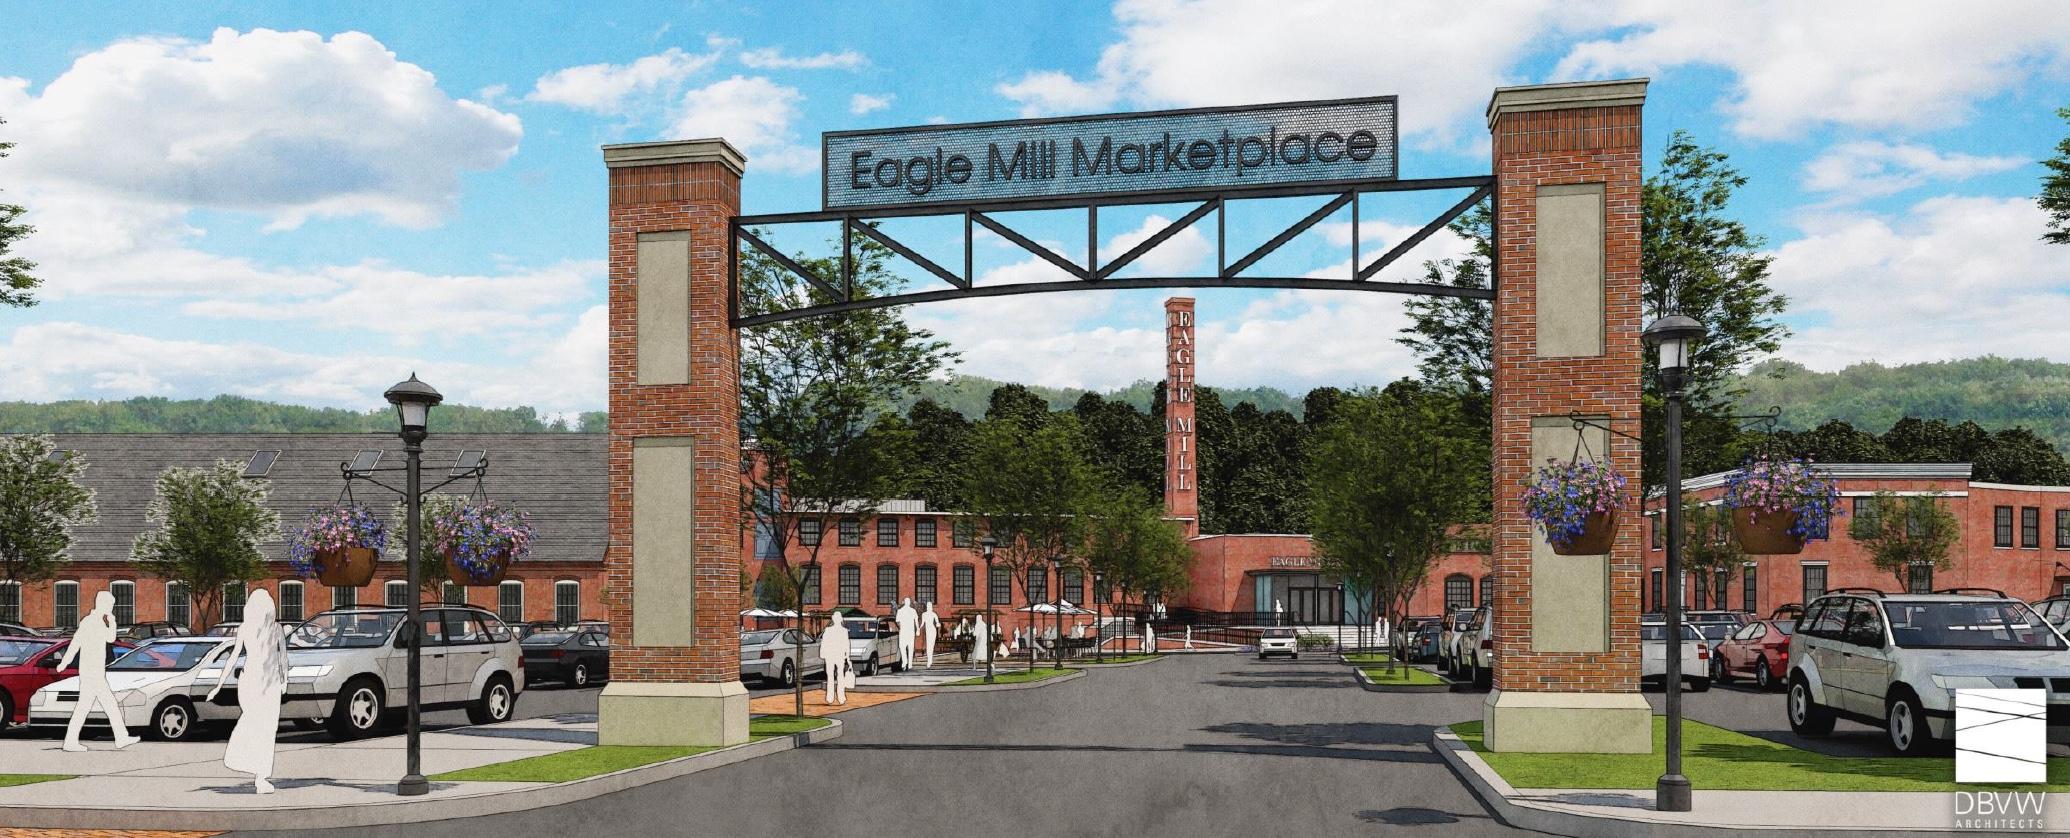 The Eagle Mill Public Market